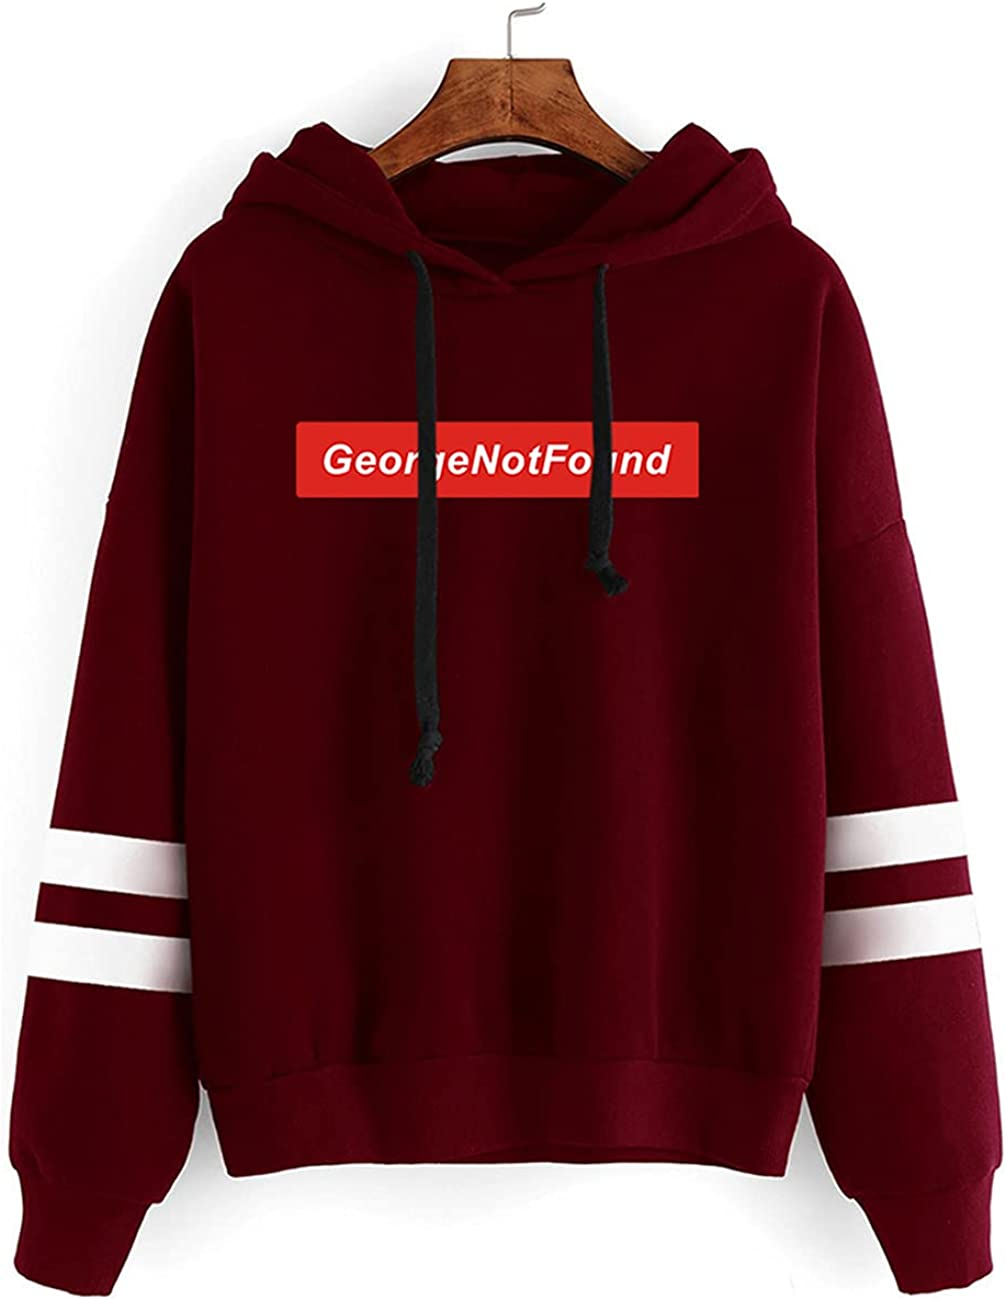 JMSUN Anime GeorgeNotFound Merch Hoodie Sweatshirts Men/Women Pullover Tracksuit